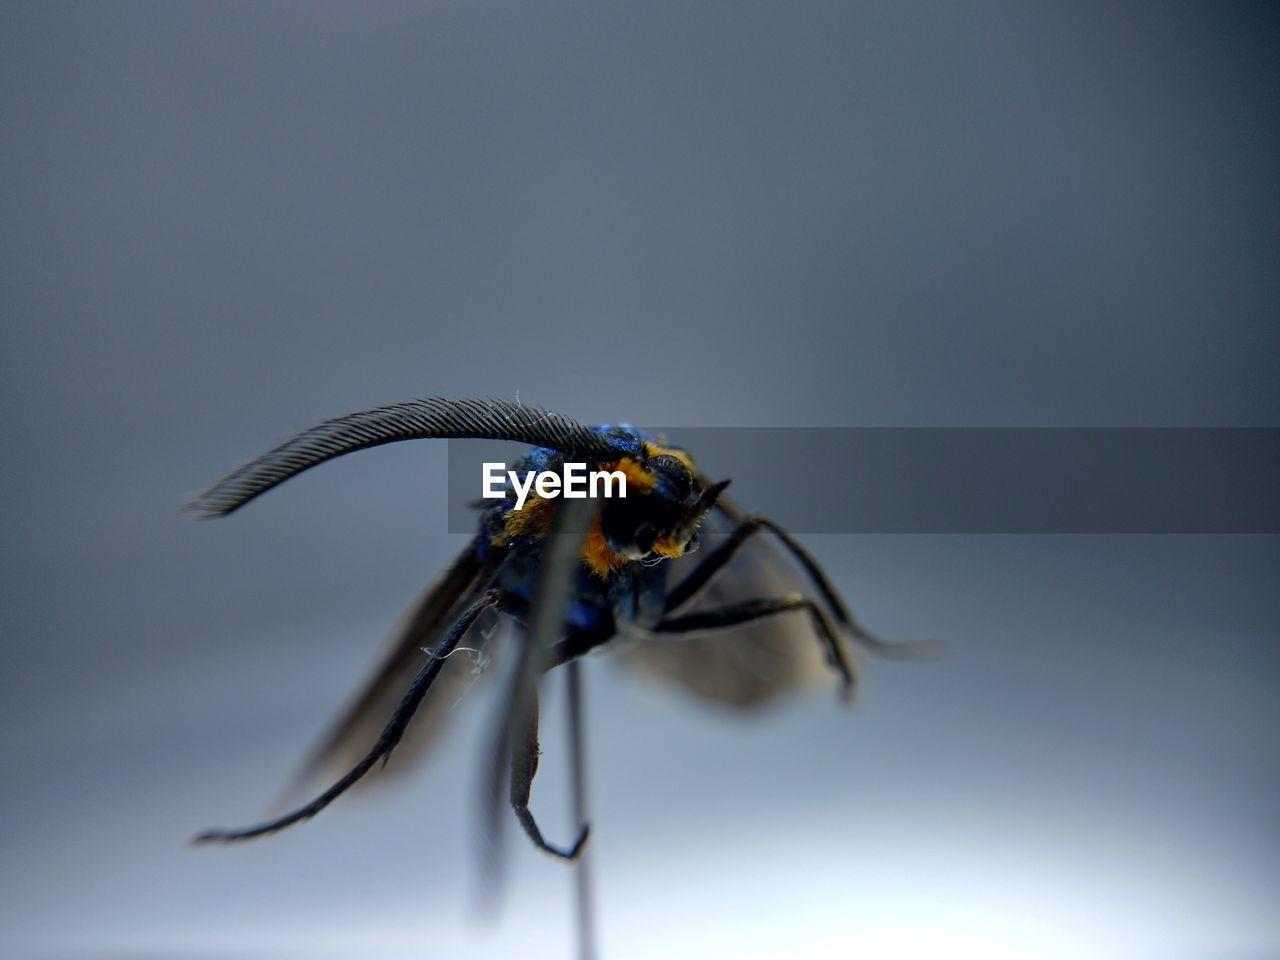 Close-up of virginia ctenucha against gray background